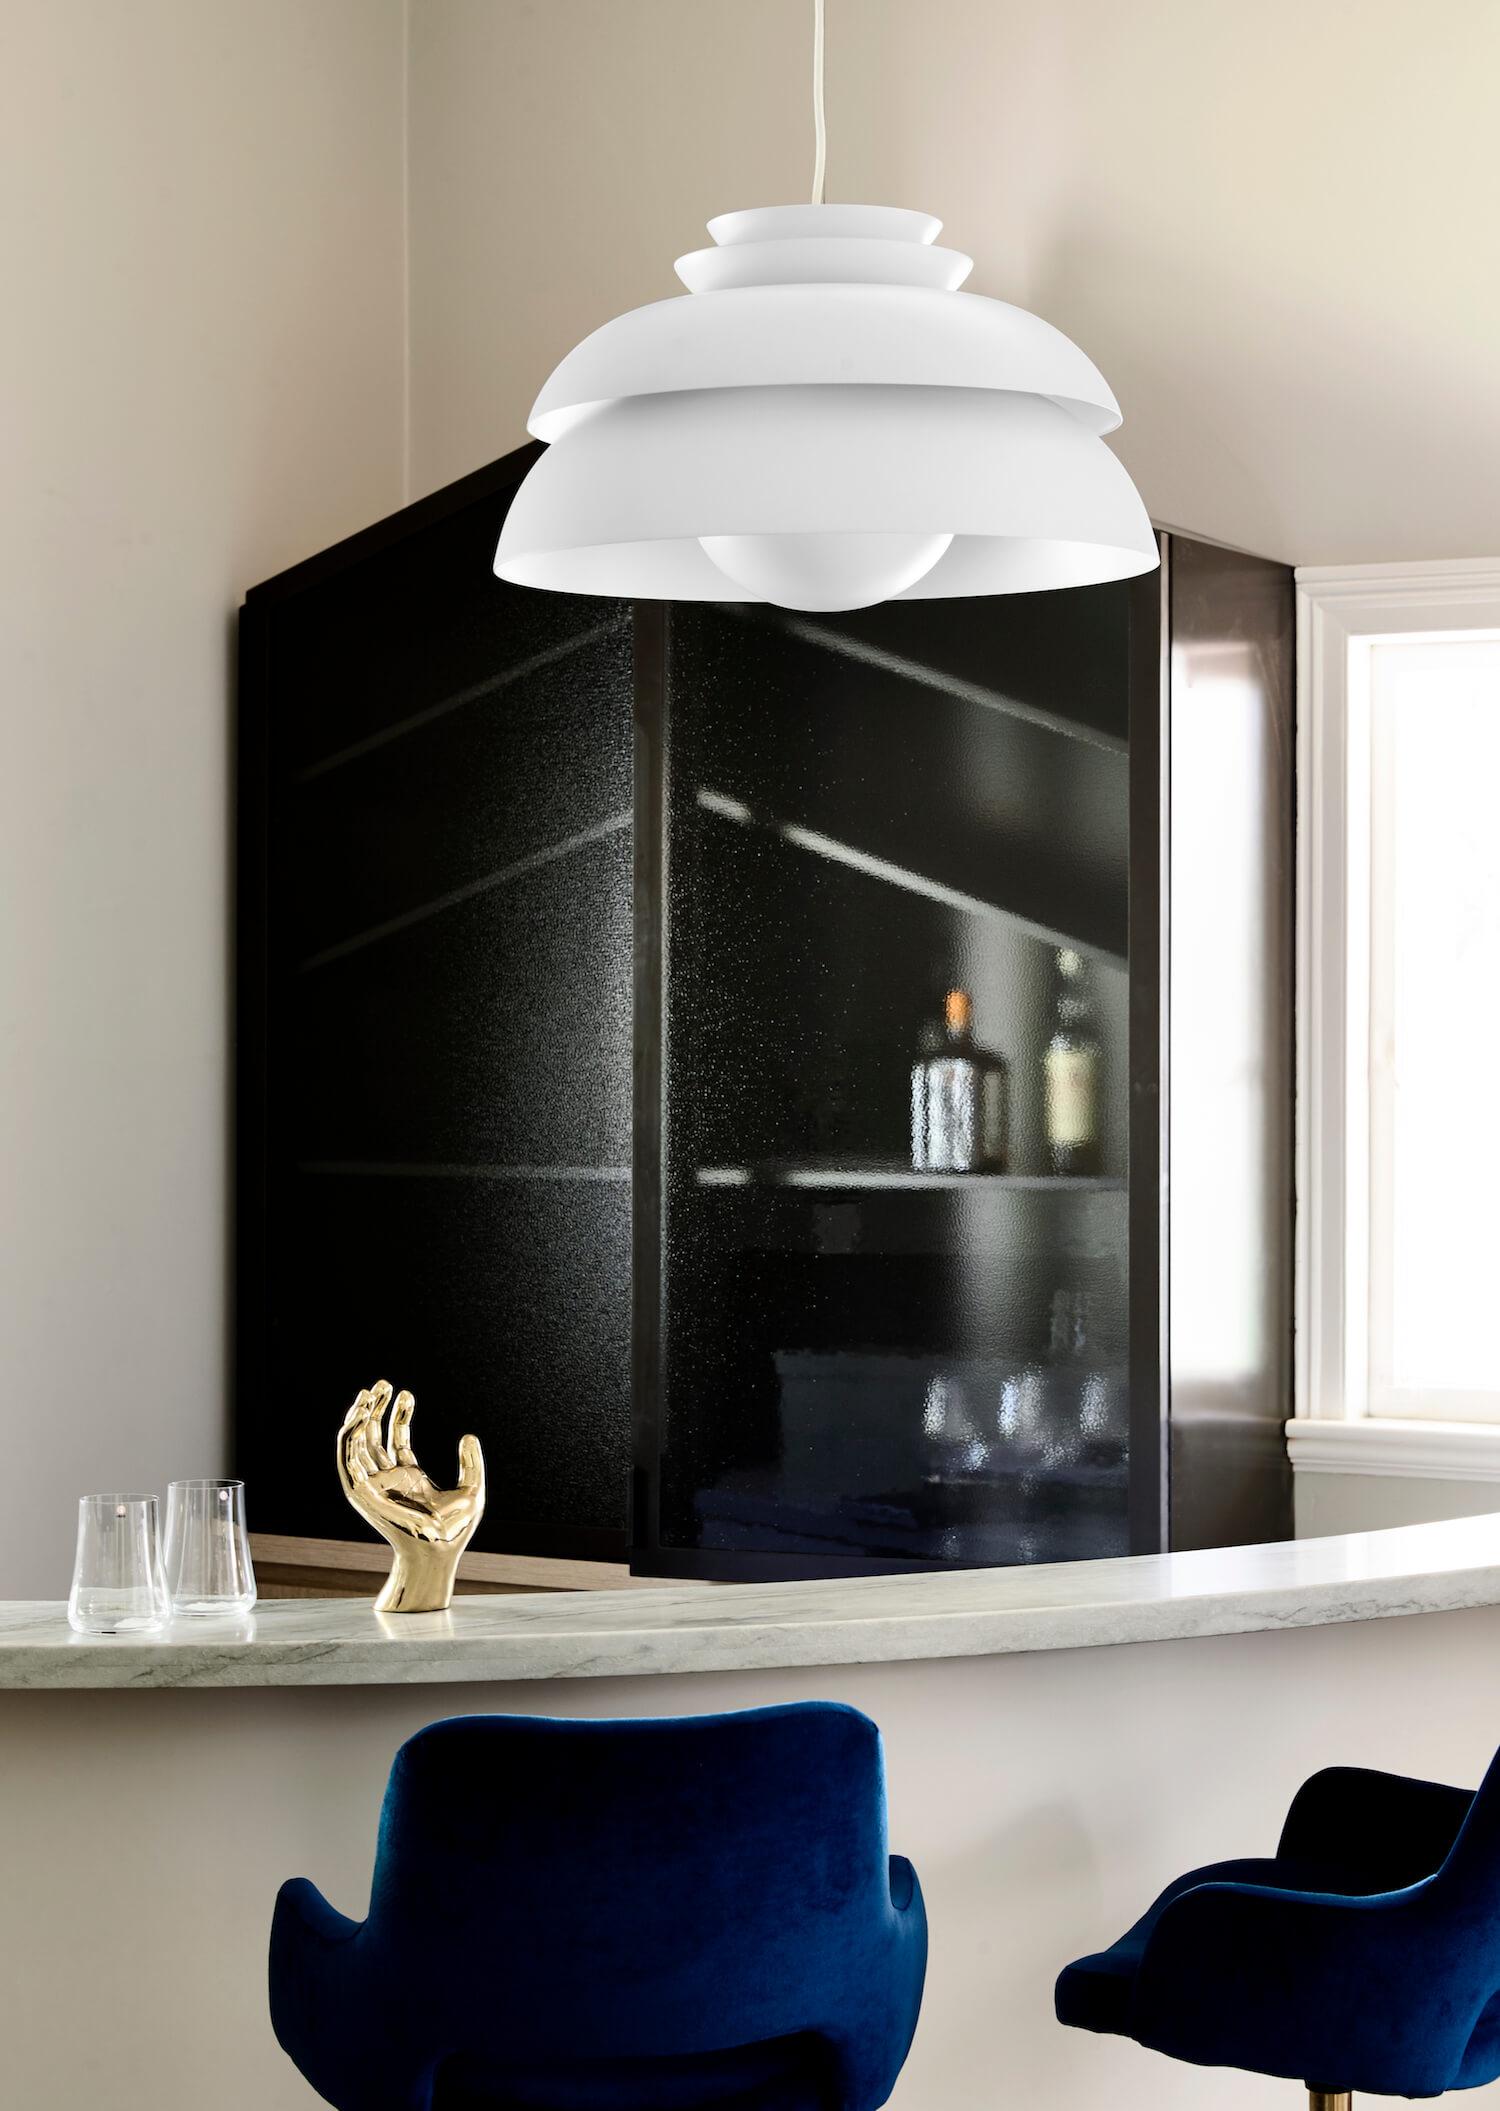 est living australian interiors doherty design ivanhoe 5